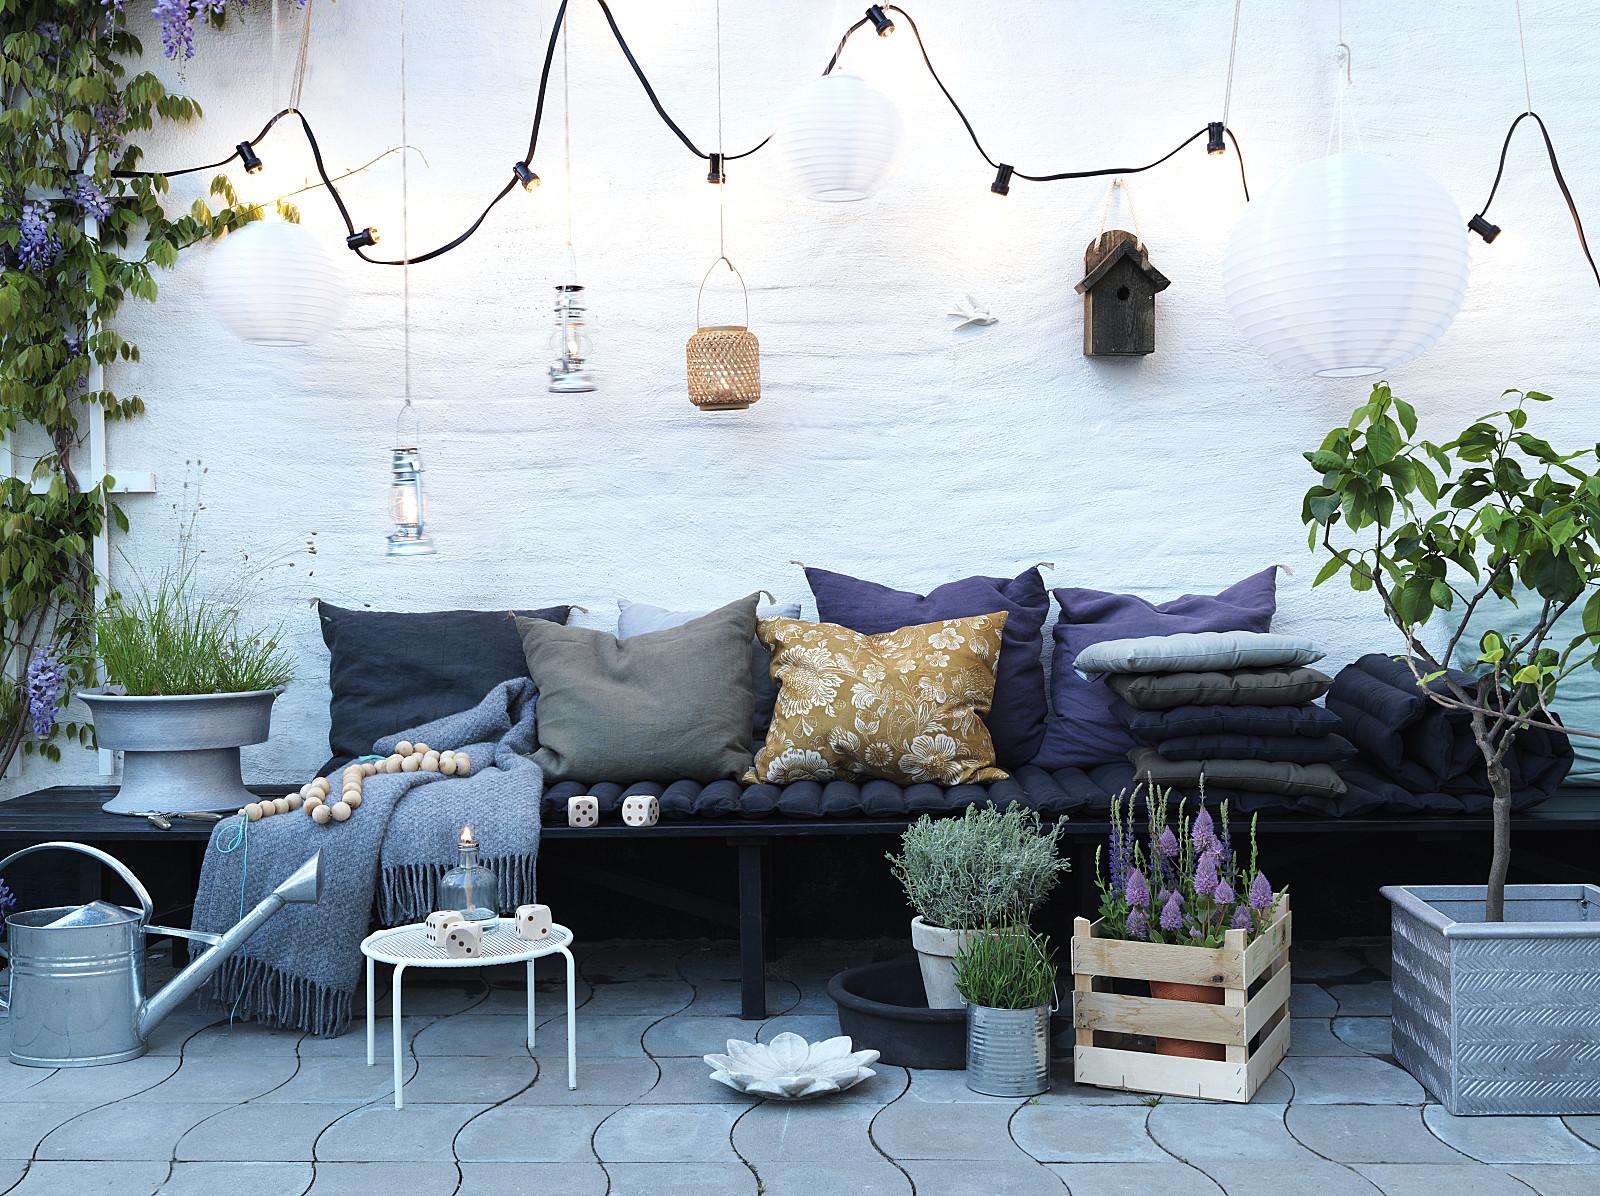 juillet 2013 tous les tages le blog. Black Bedroom Furniture Sets. Home Design Ideas